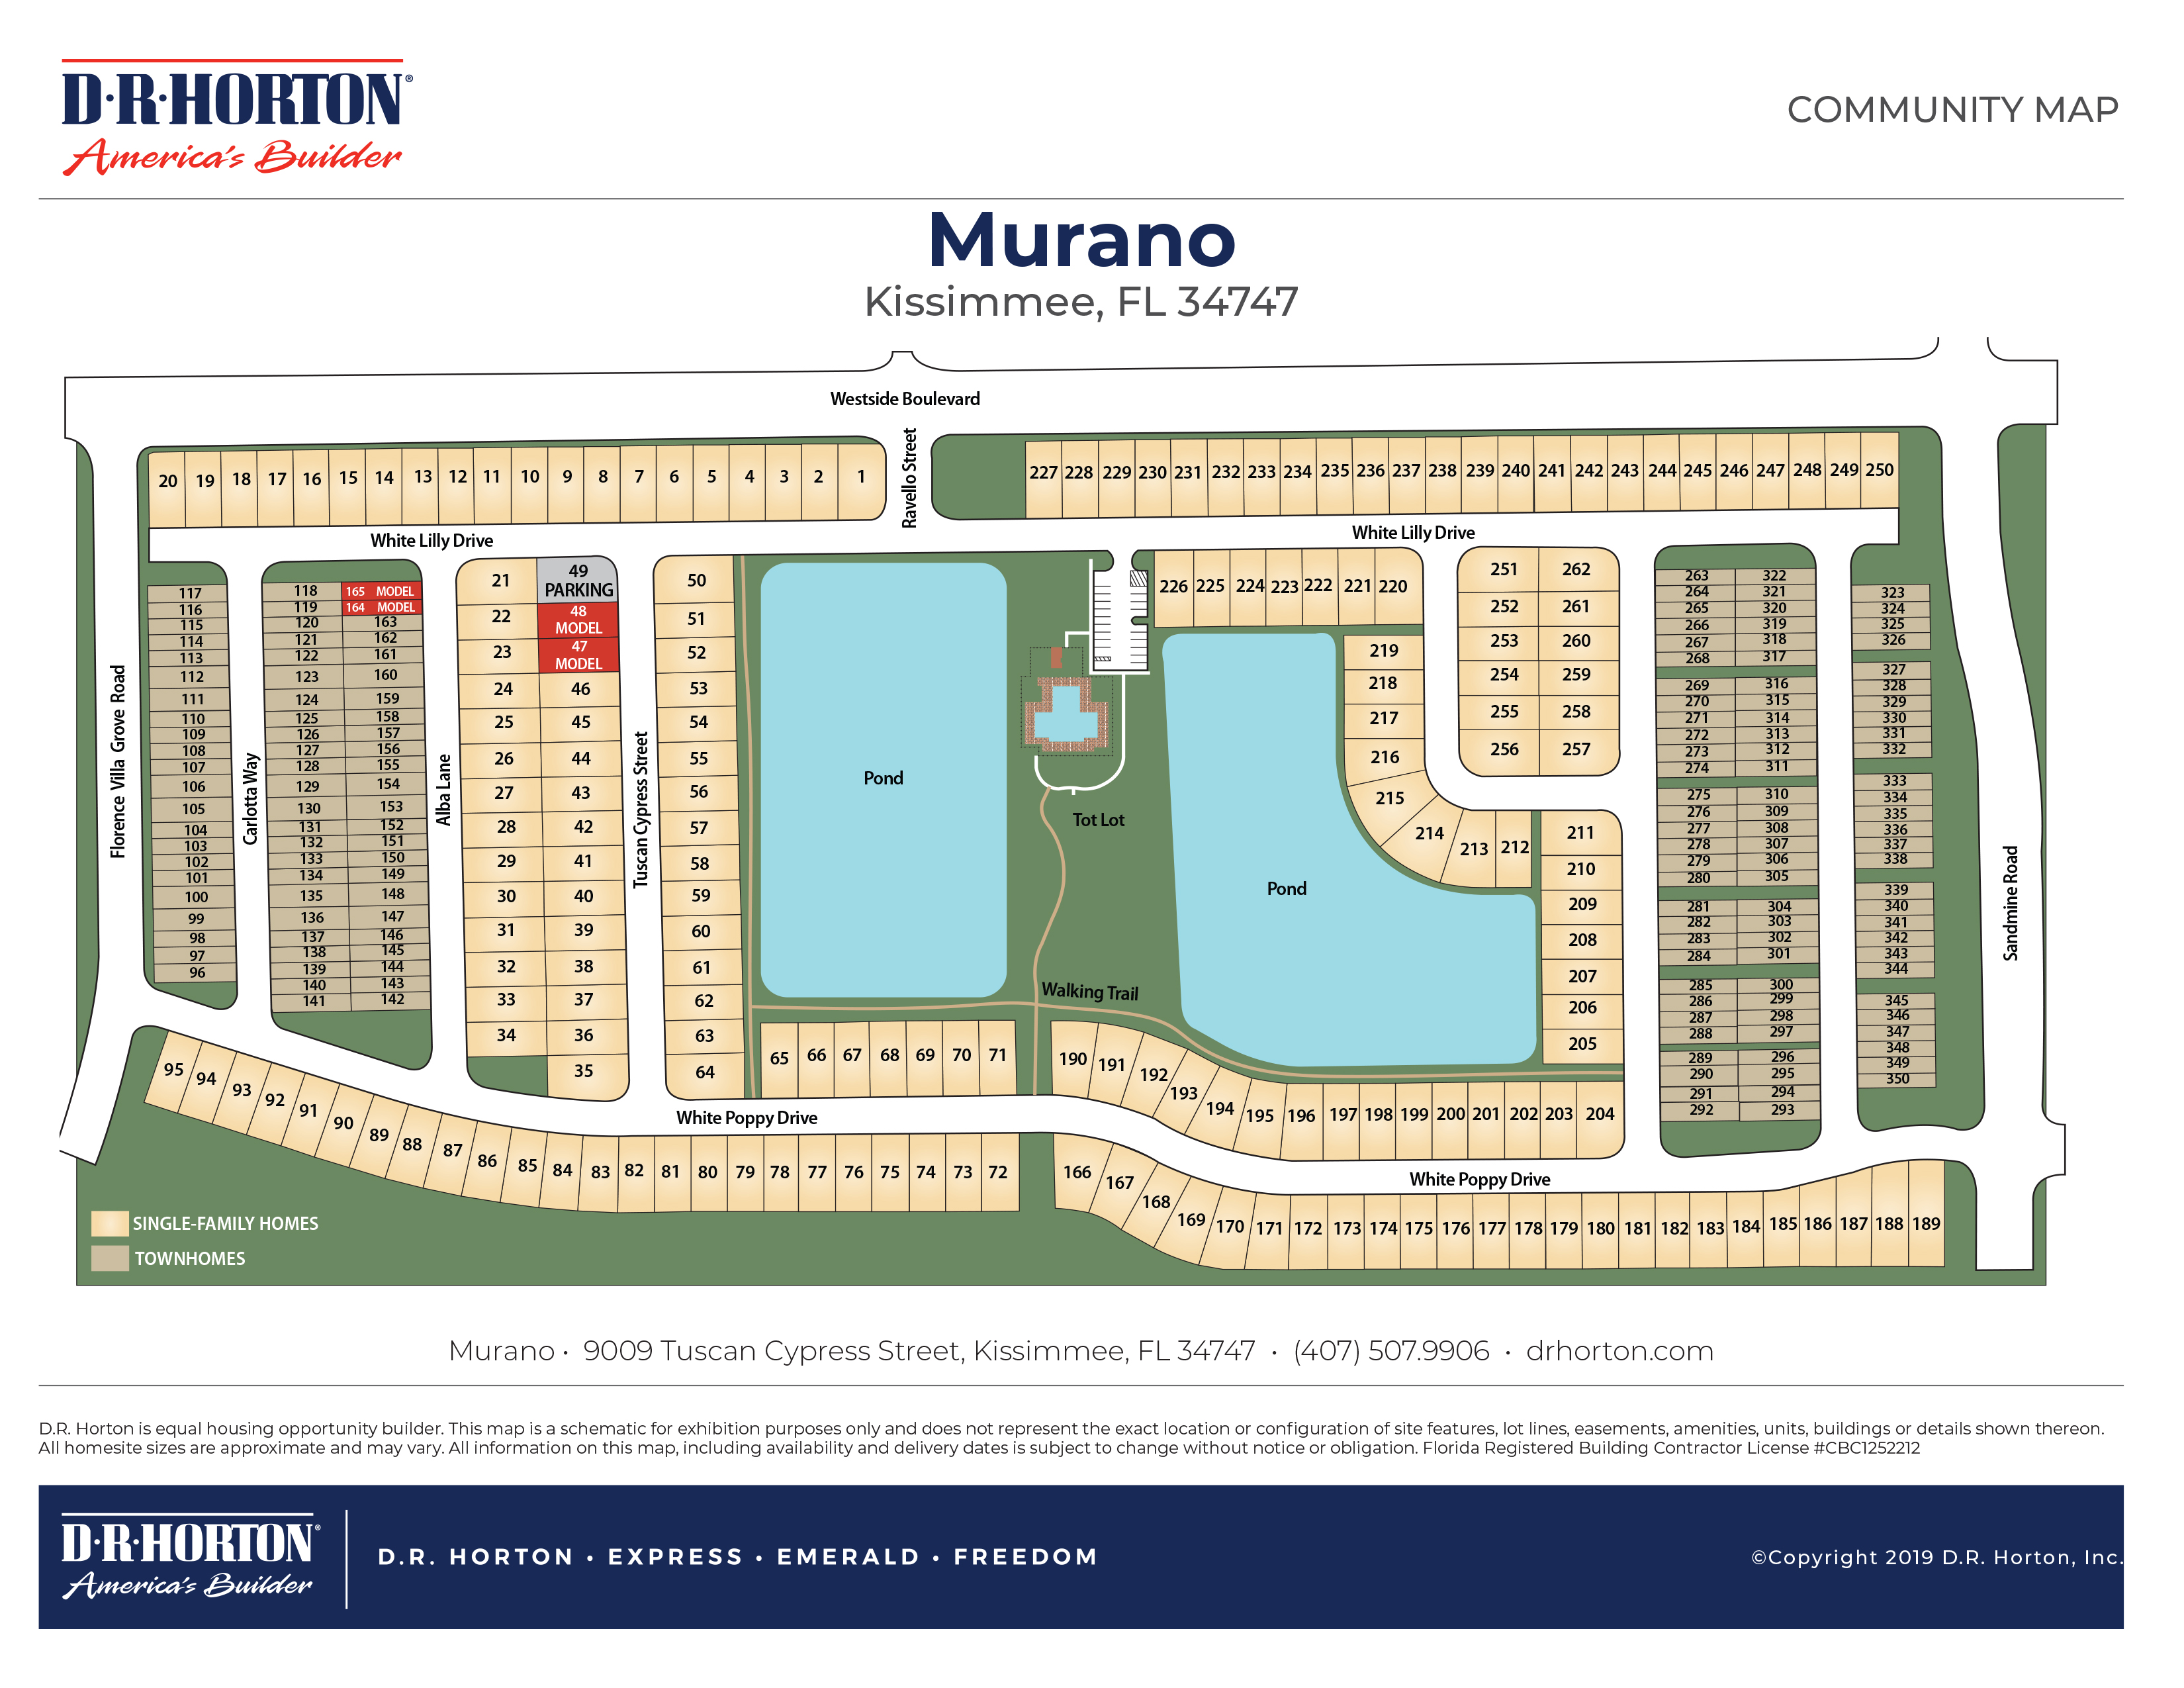 New Homes in Murano | Kissimmee, Florida | D.R. Horton on kissimmee neighborhood map, kissimmee area map, kissimmee street names, kissimmee area attractions, kissimmee florida, kissimmee downtown map,